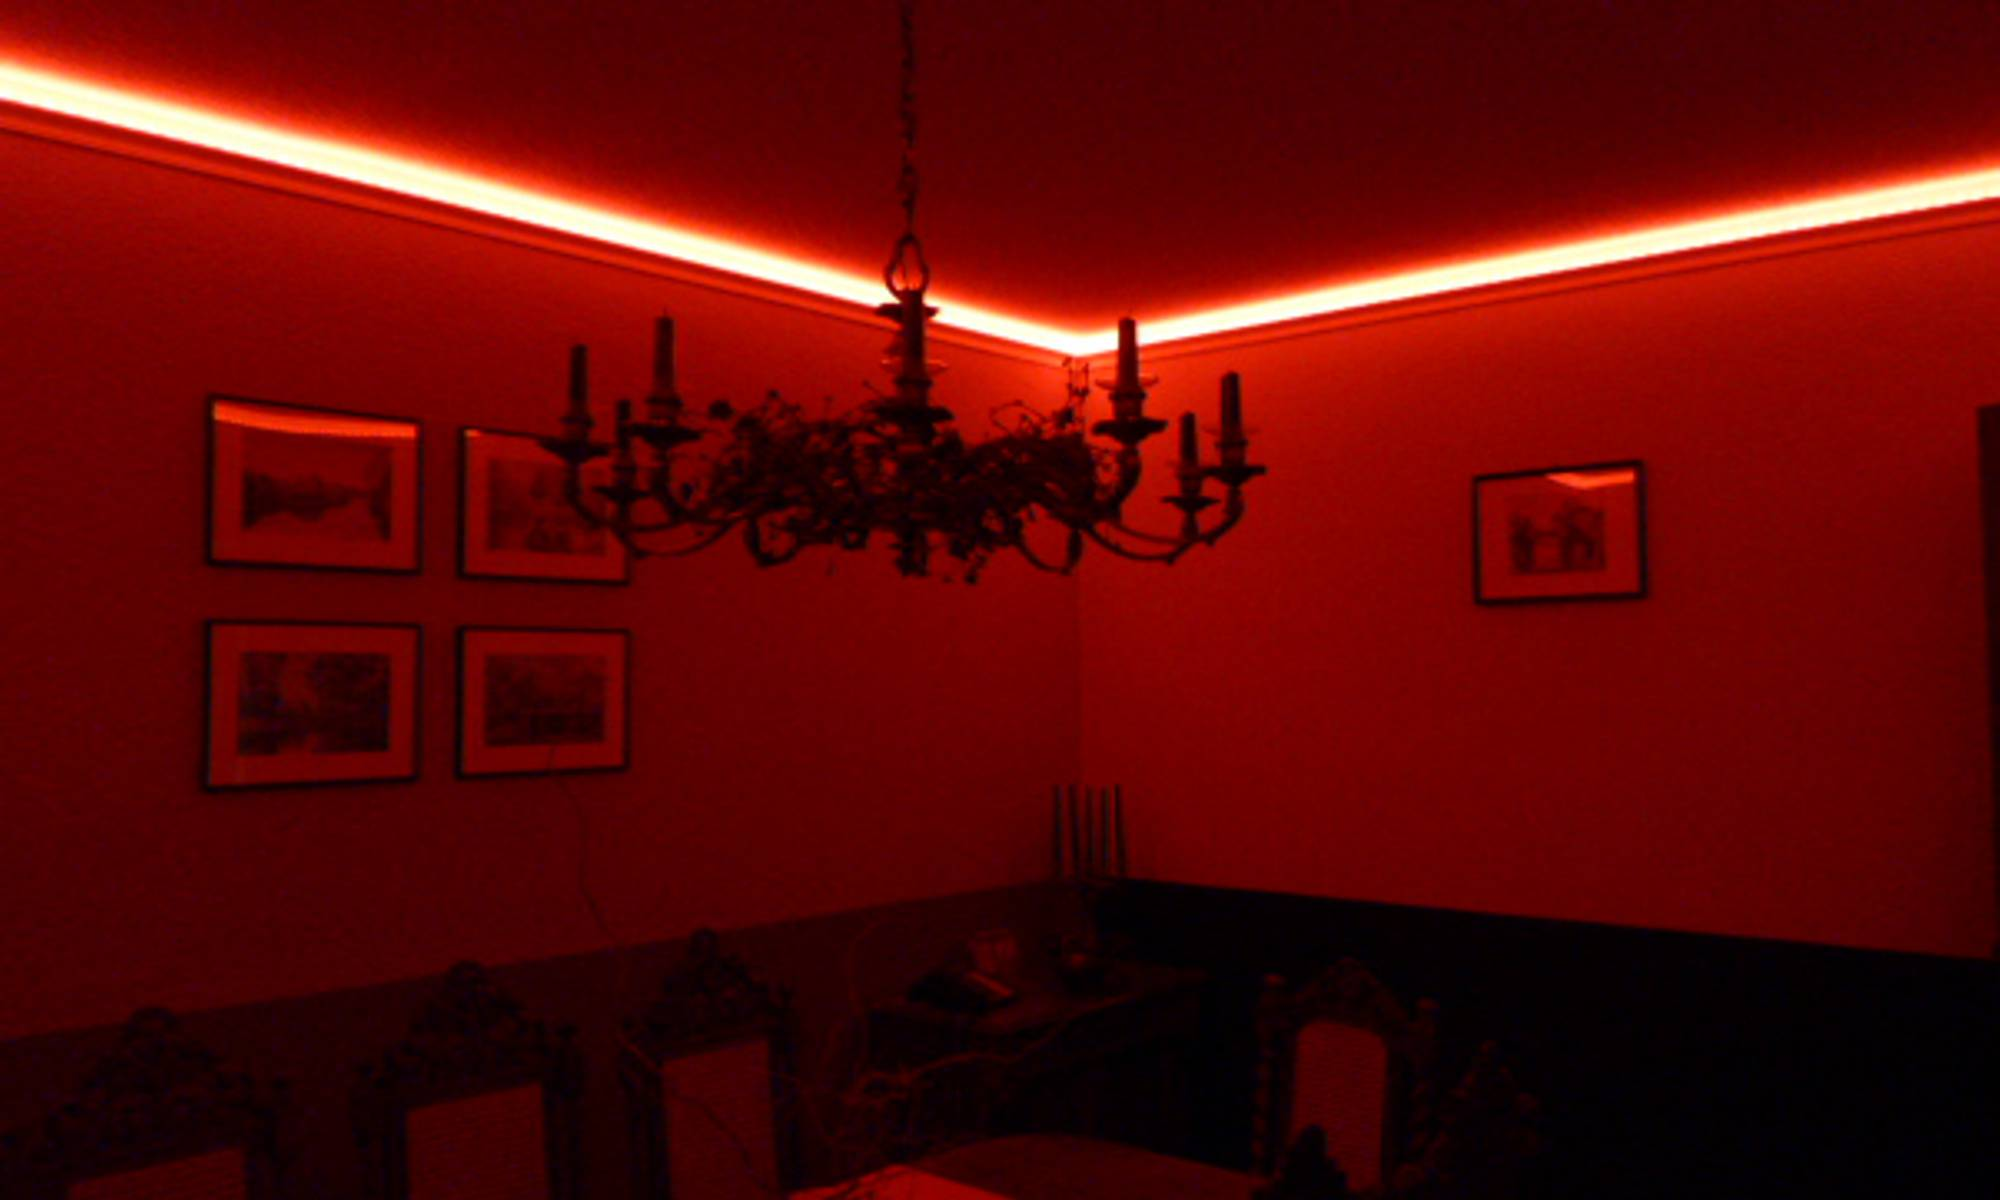 RGB_Rot